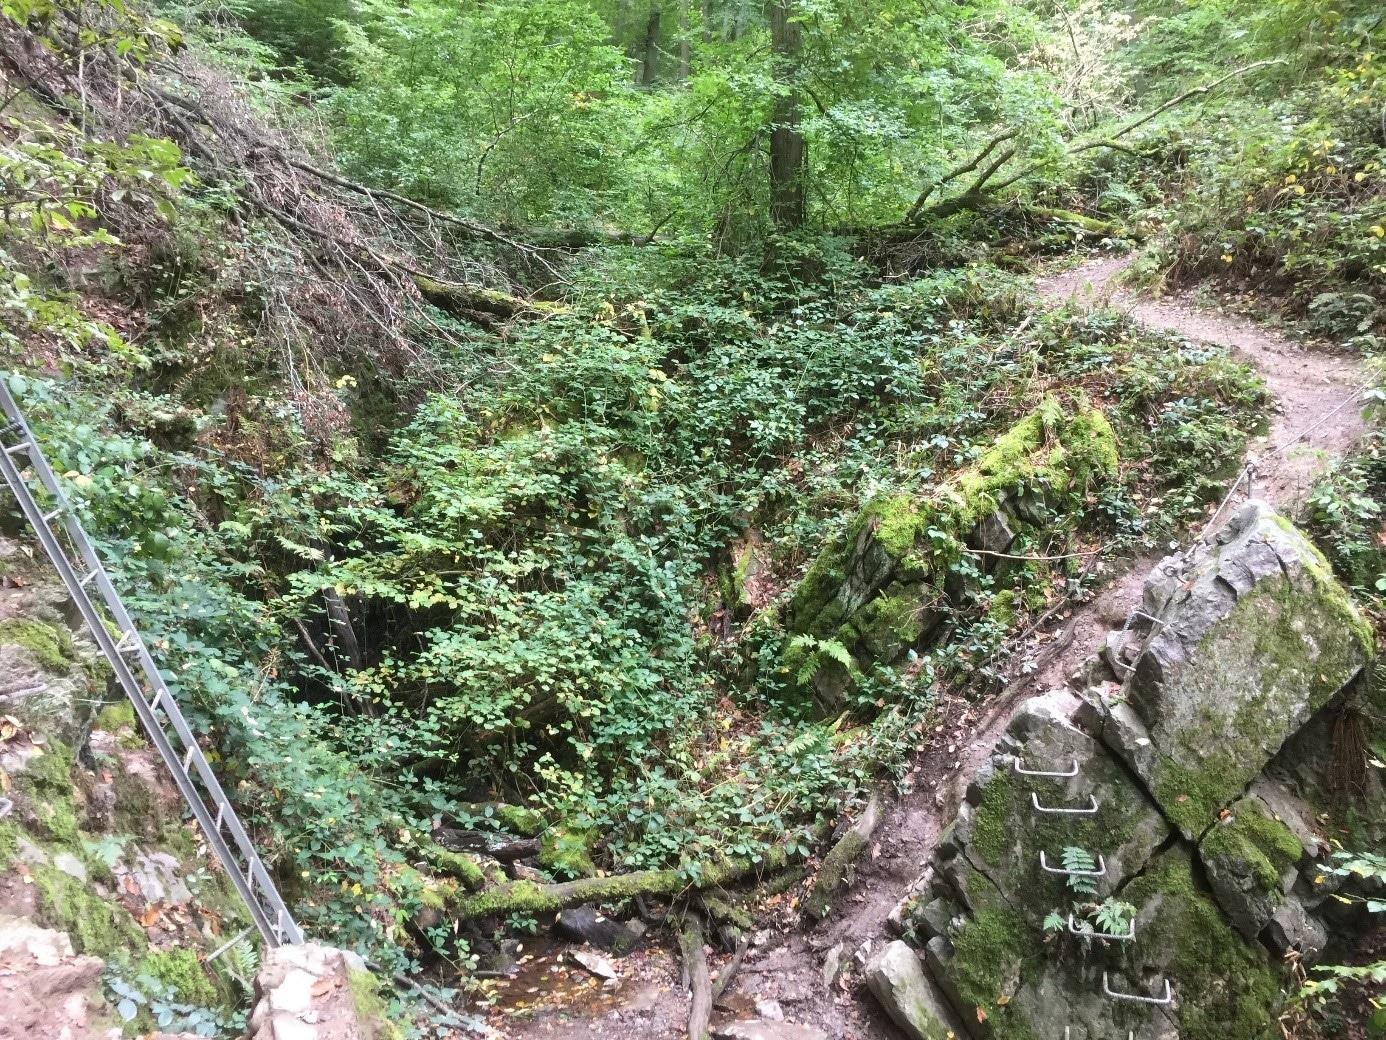 Naturcoaching im Rheintal